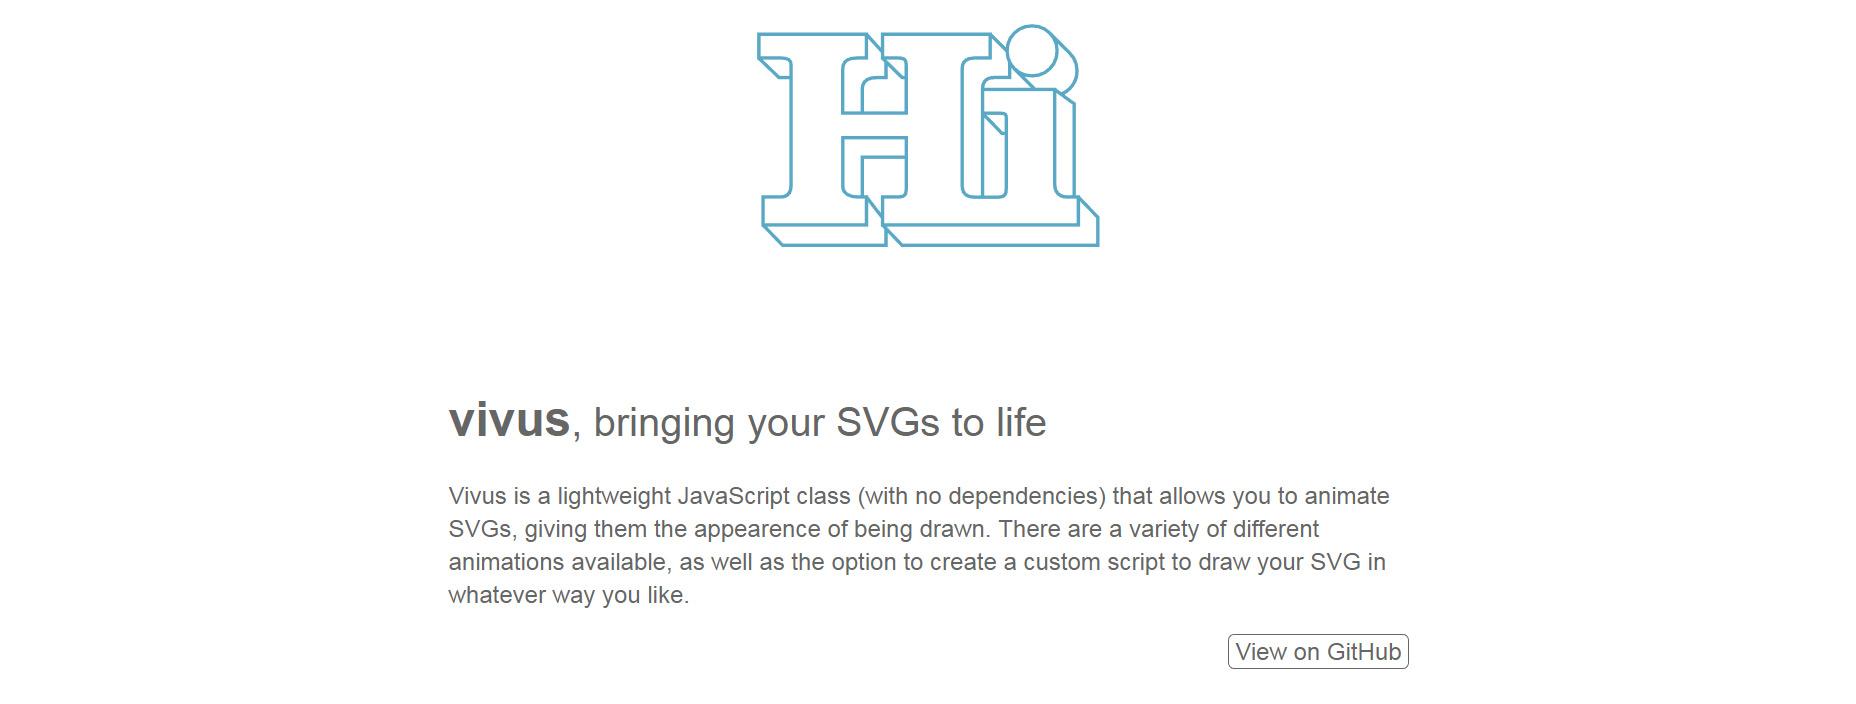 08-vivus-js-homepage.